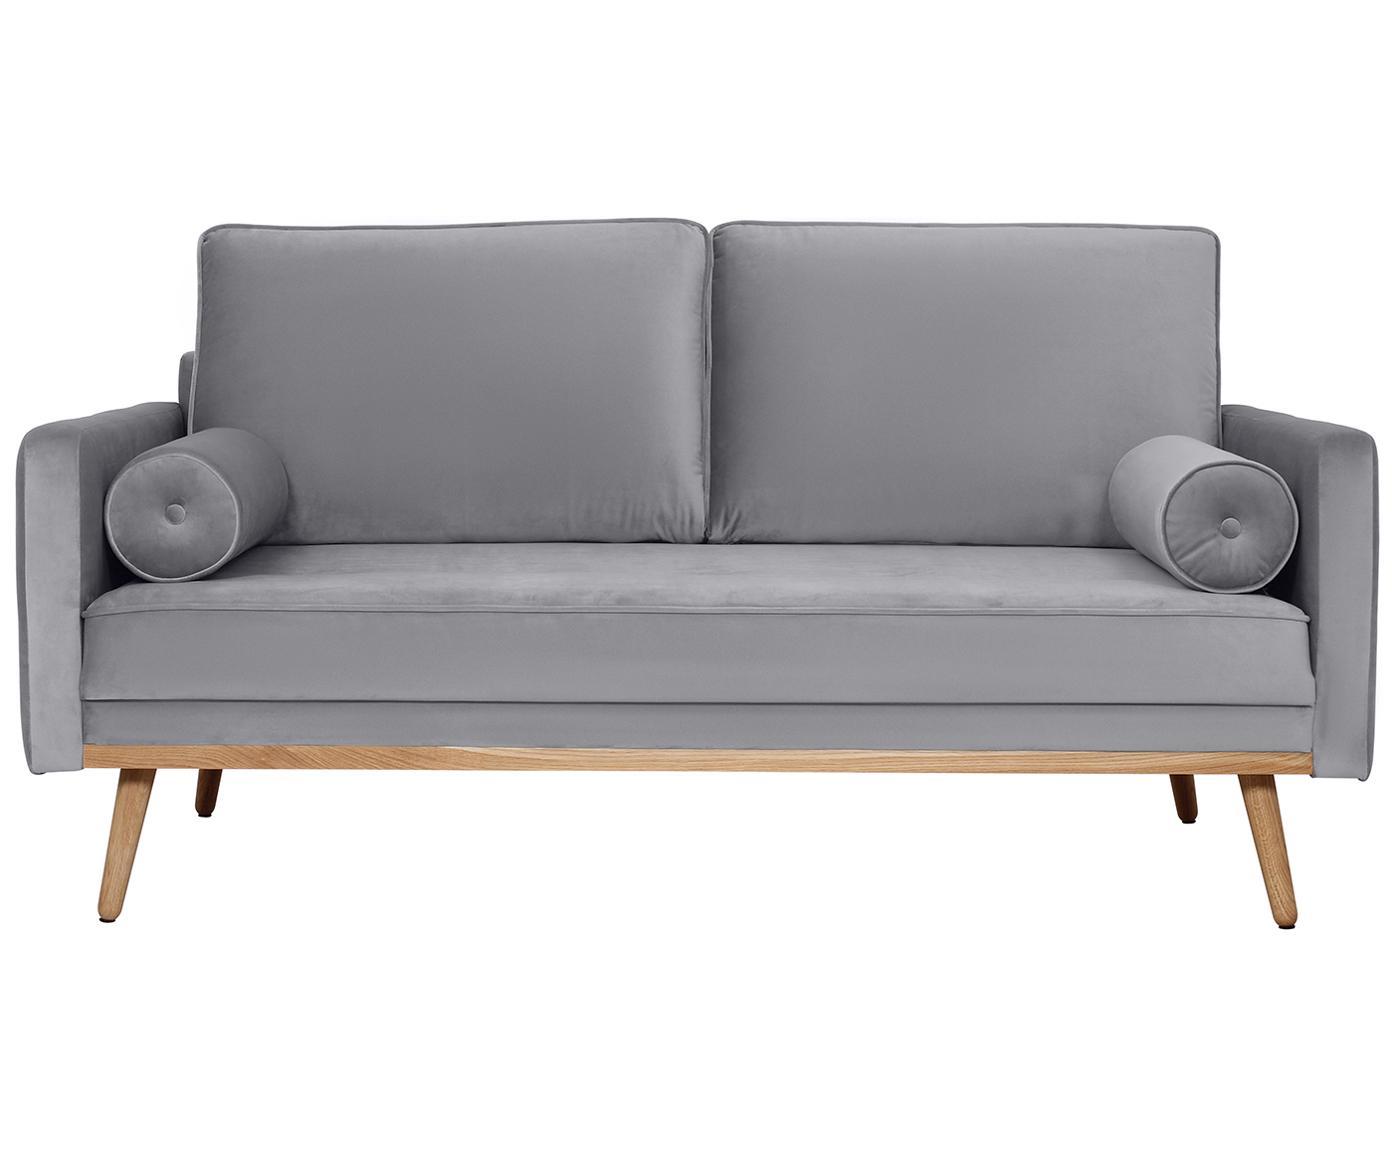 Fluwelen bank Saint (2-zits), Bekleding: fluweel (polyester), Frame: massief grenenhout, spaan, Bekleding: grijs. Poten en frame: eikenhoutkleurig, B 169 x D 87 cm